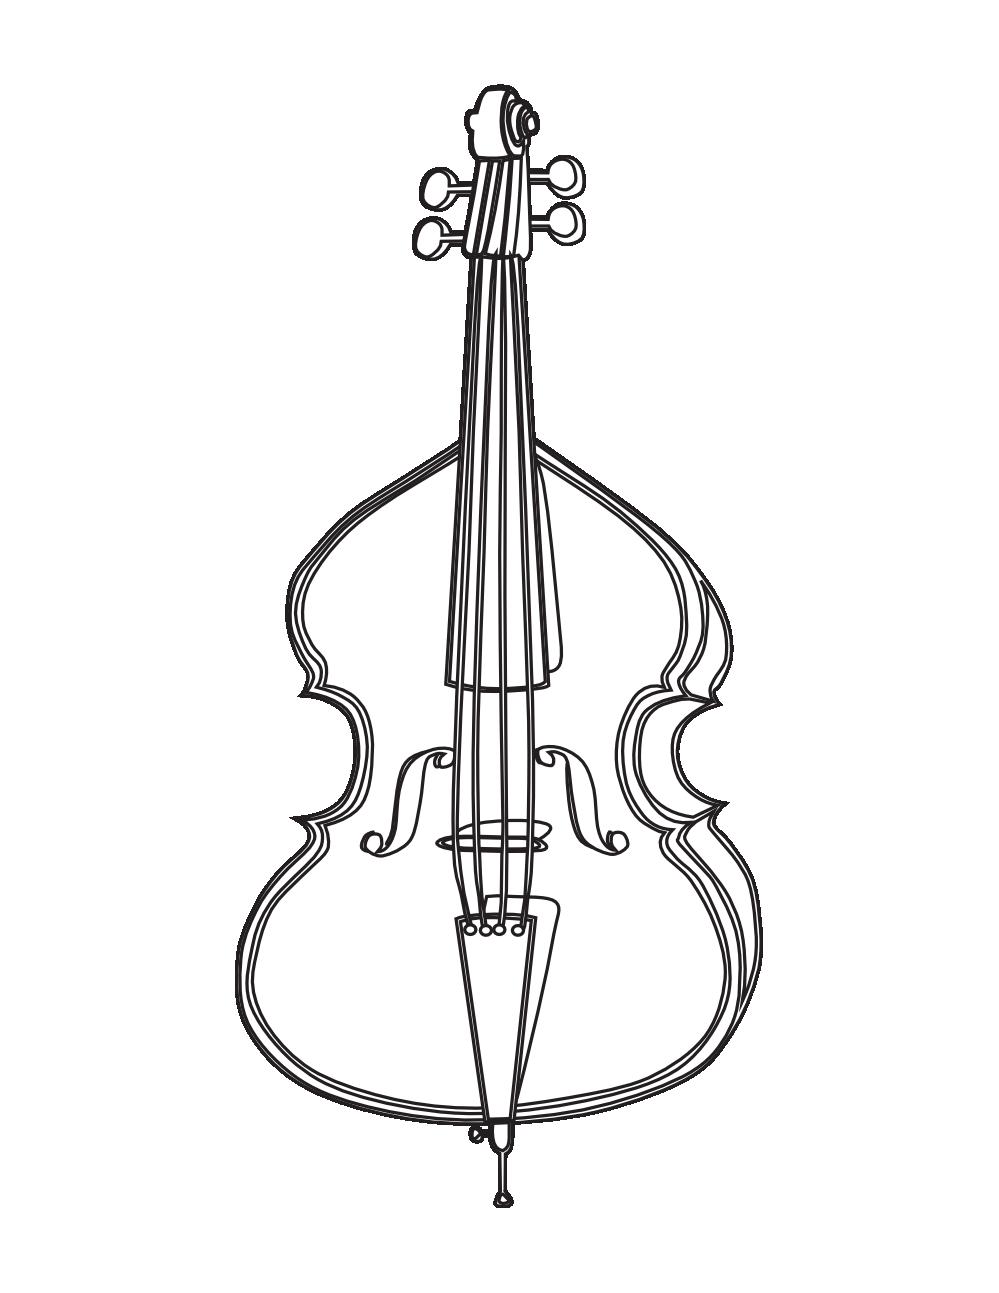 graphic library download . Cello clipart black and white.